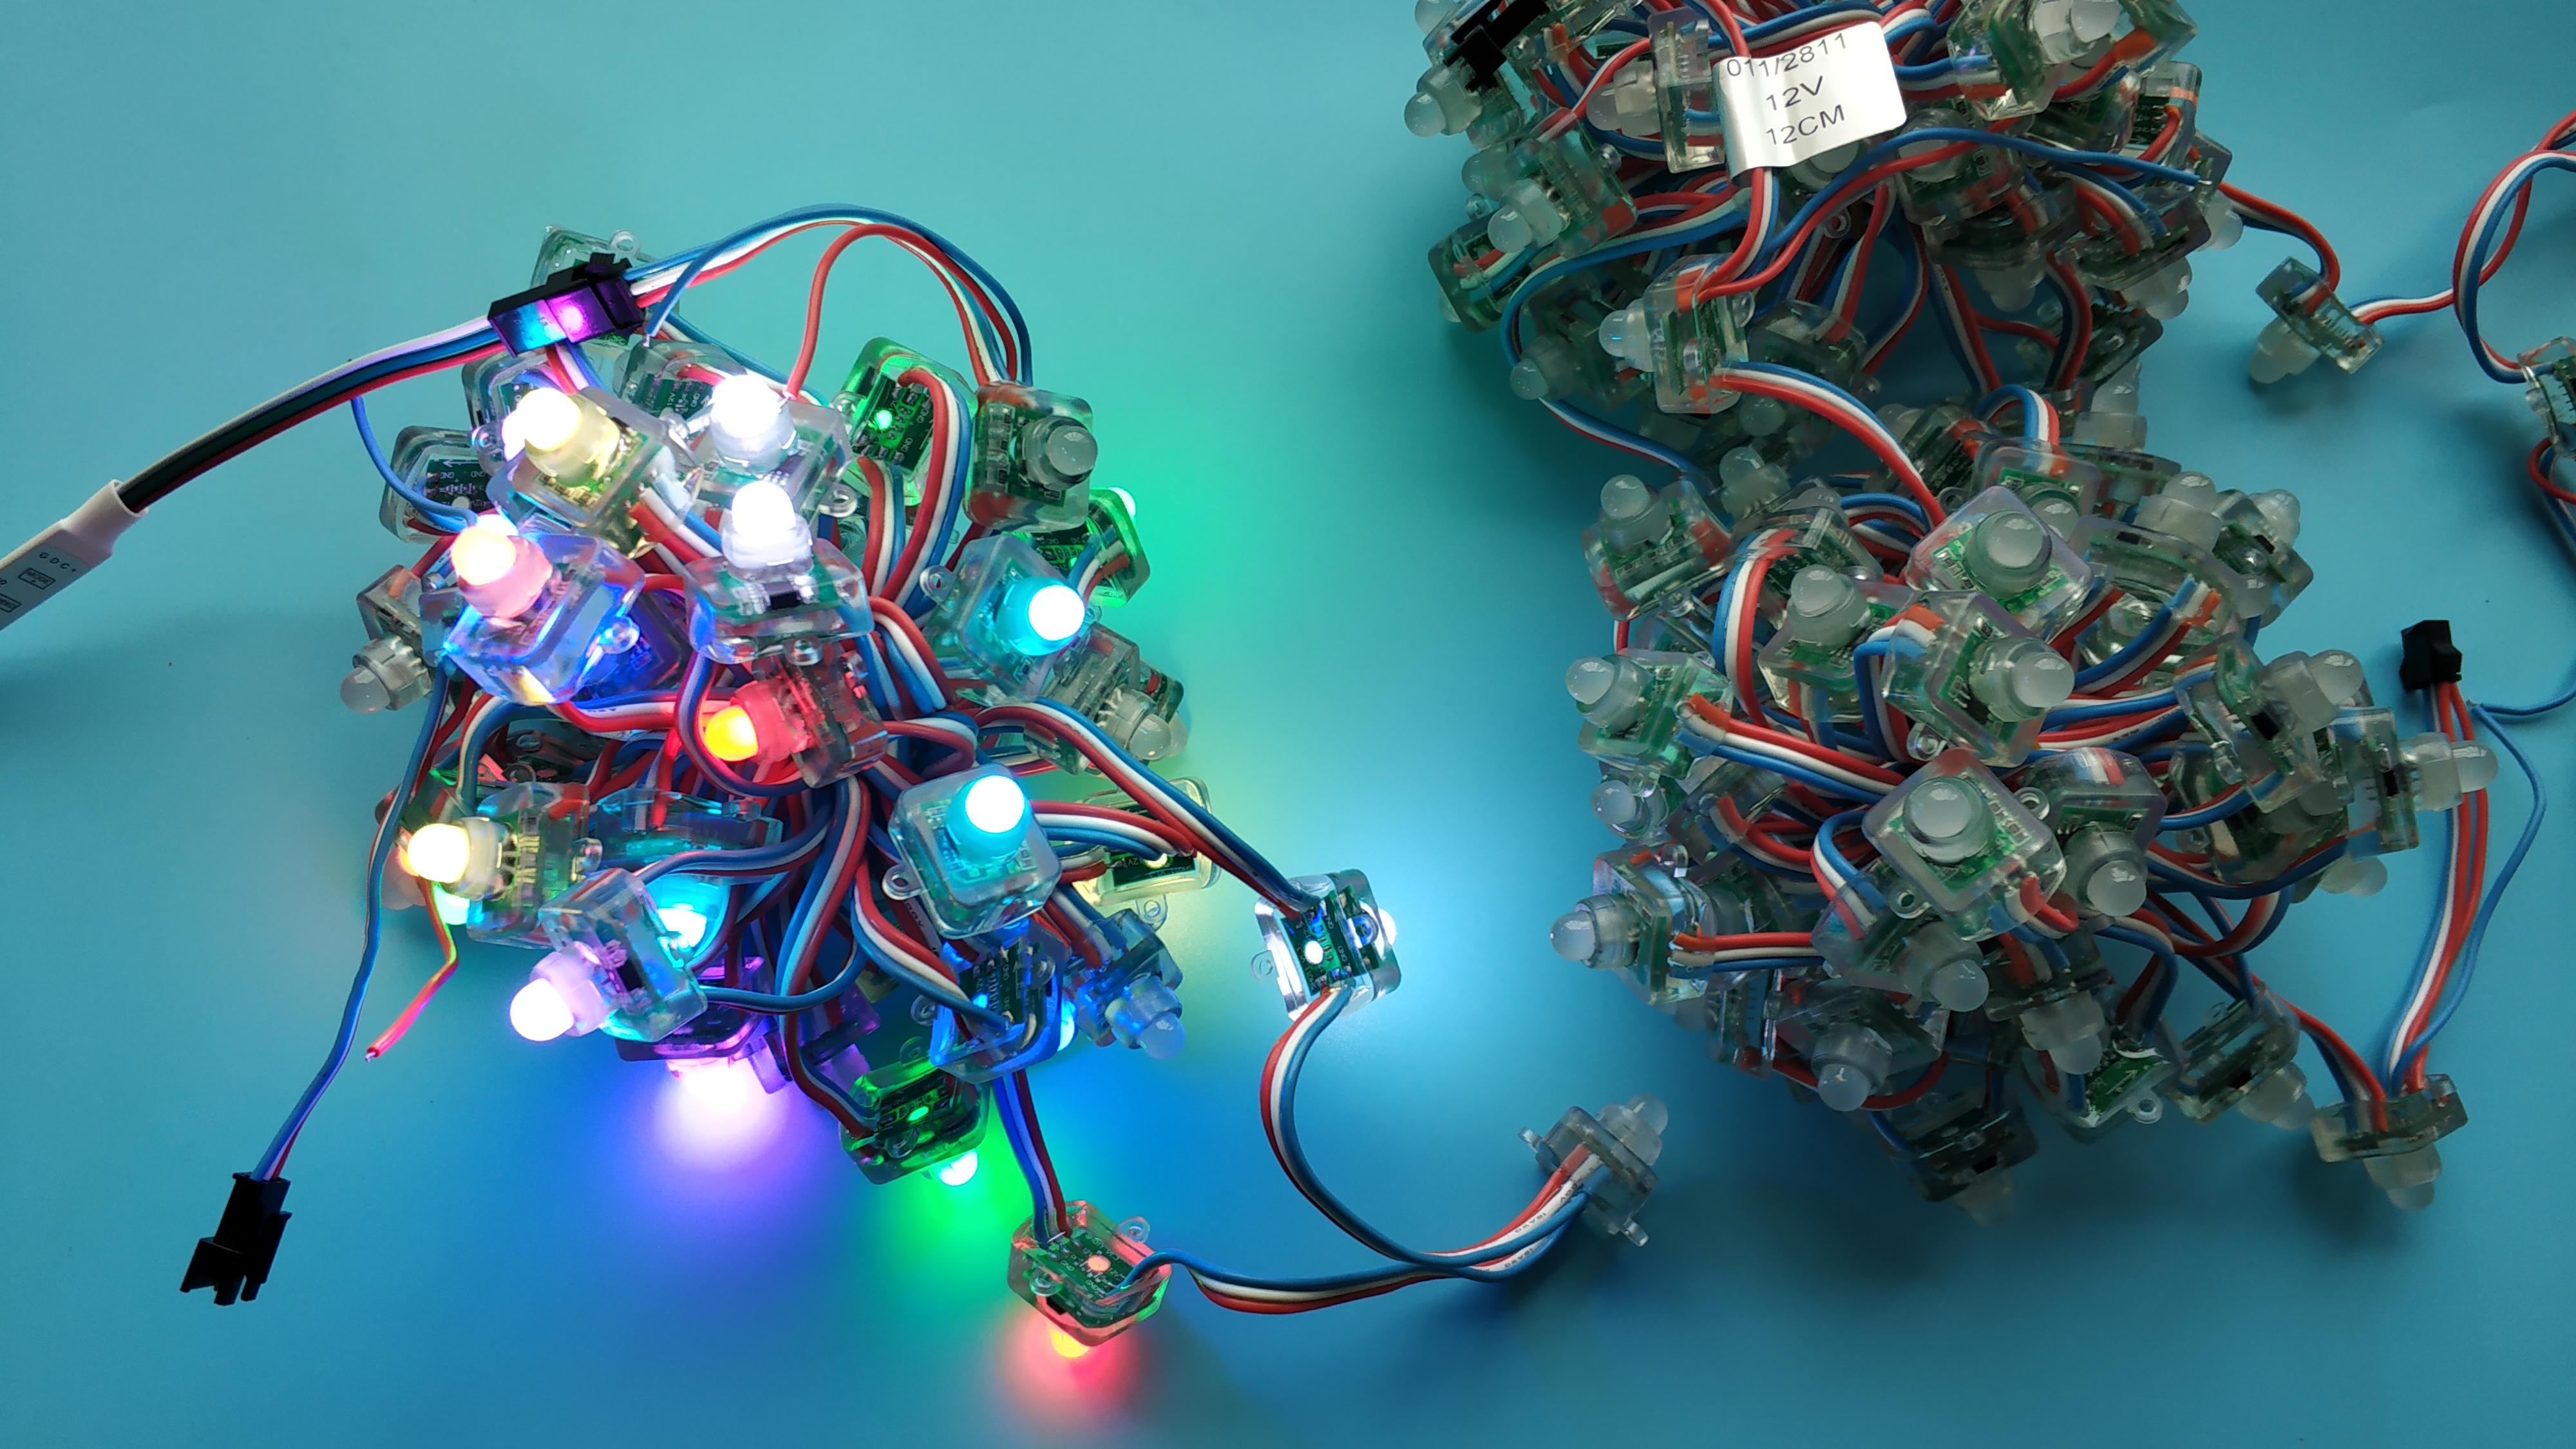 12V WS2811 RGB LED pixel node string